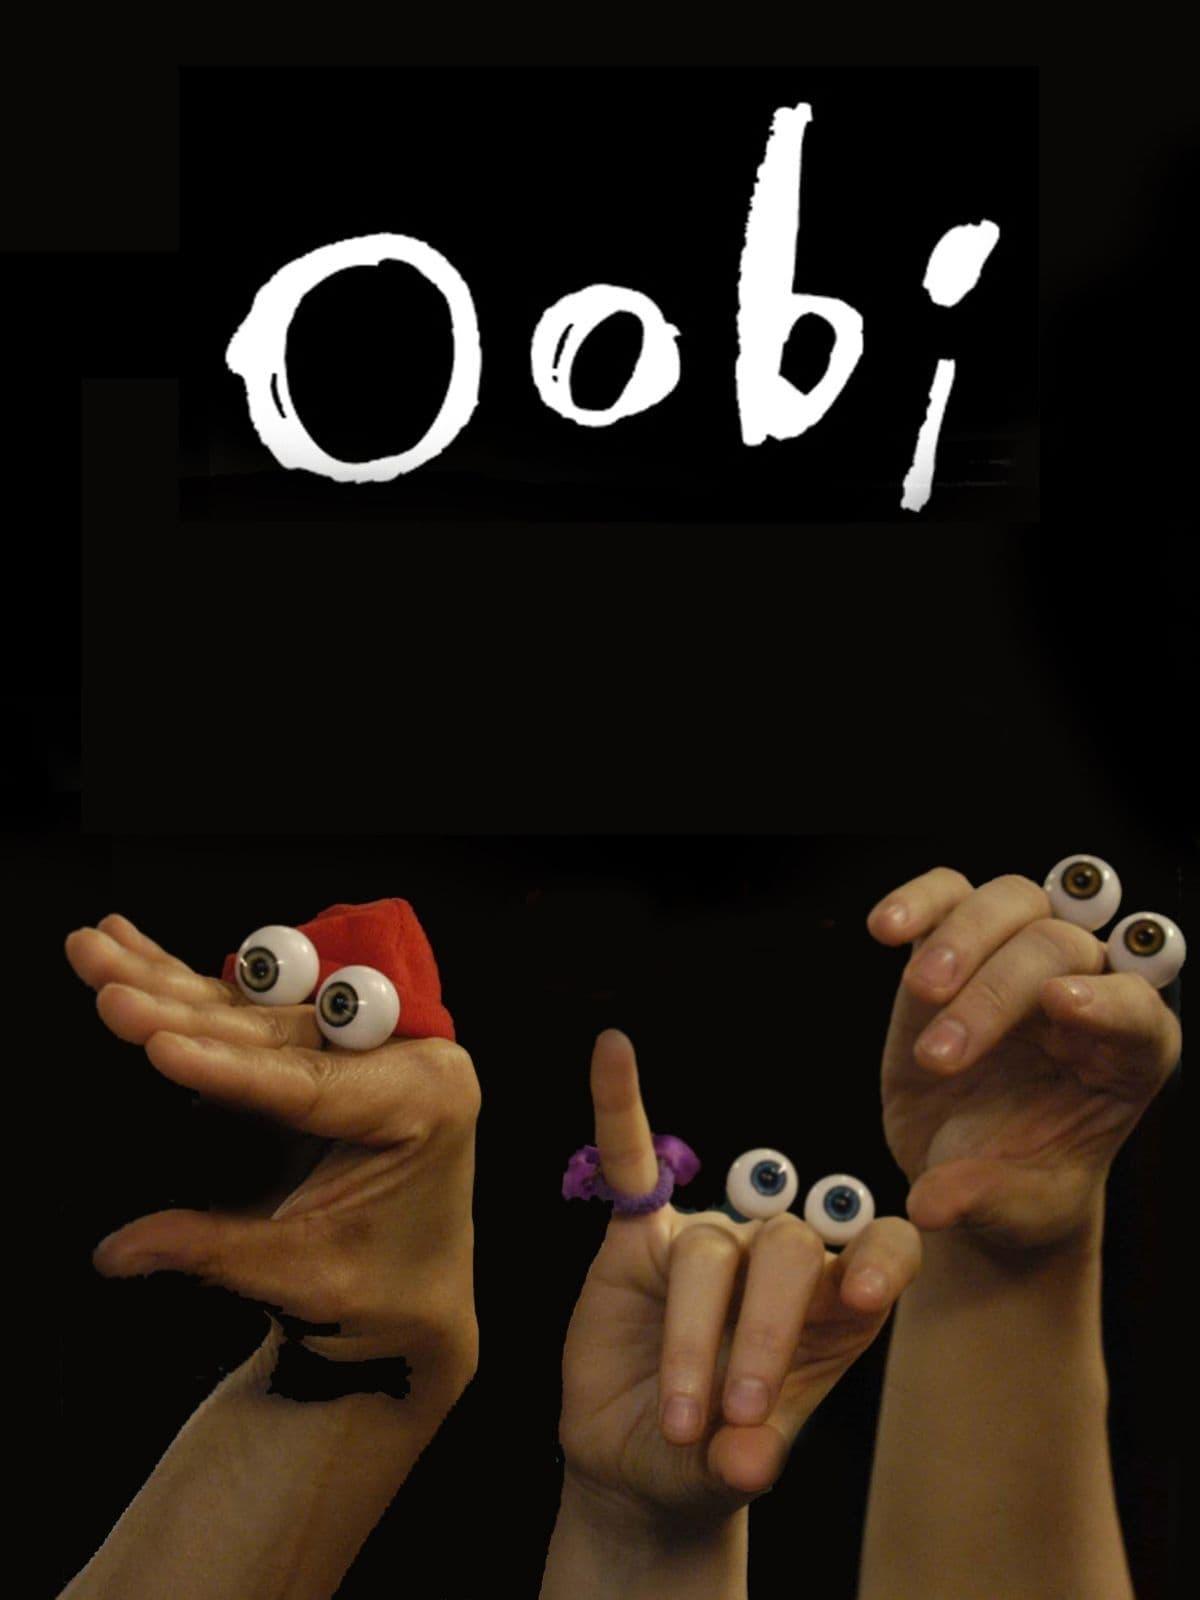 Oobi (2003)